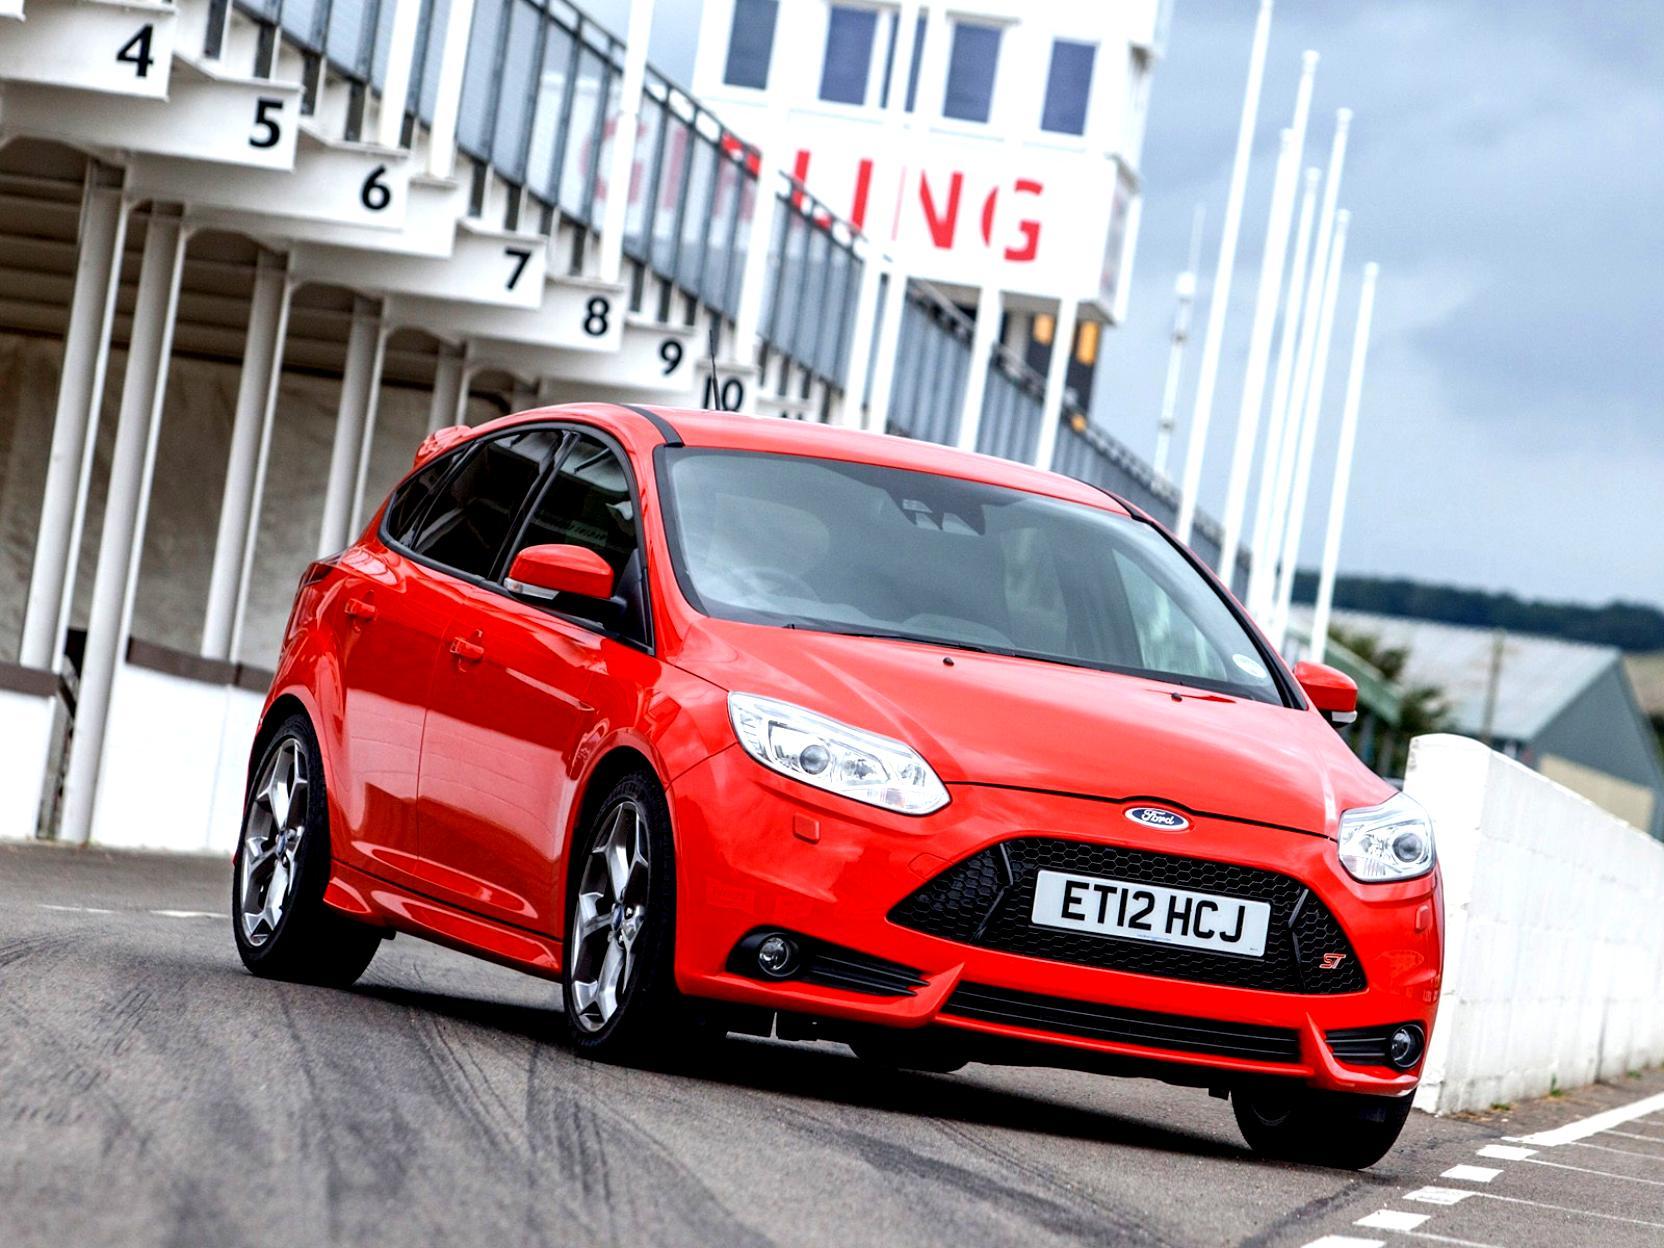 Какая гарантия на кузов Ford Focus 3?